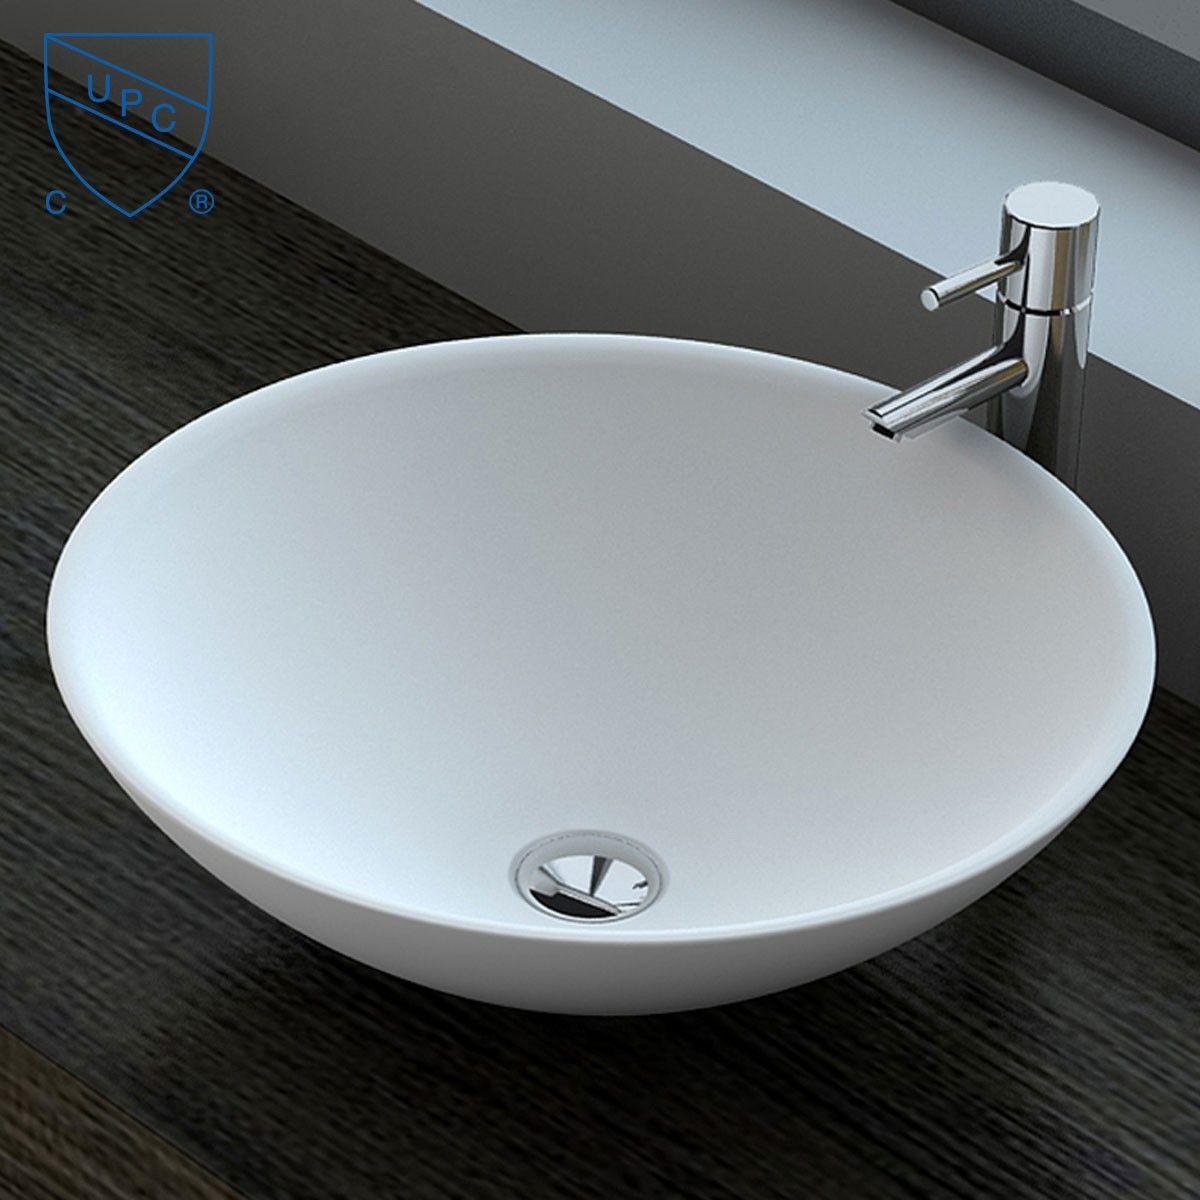 Decoraport White Round Ceramic Above Counter Basin (CL-1030)